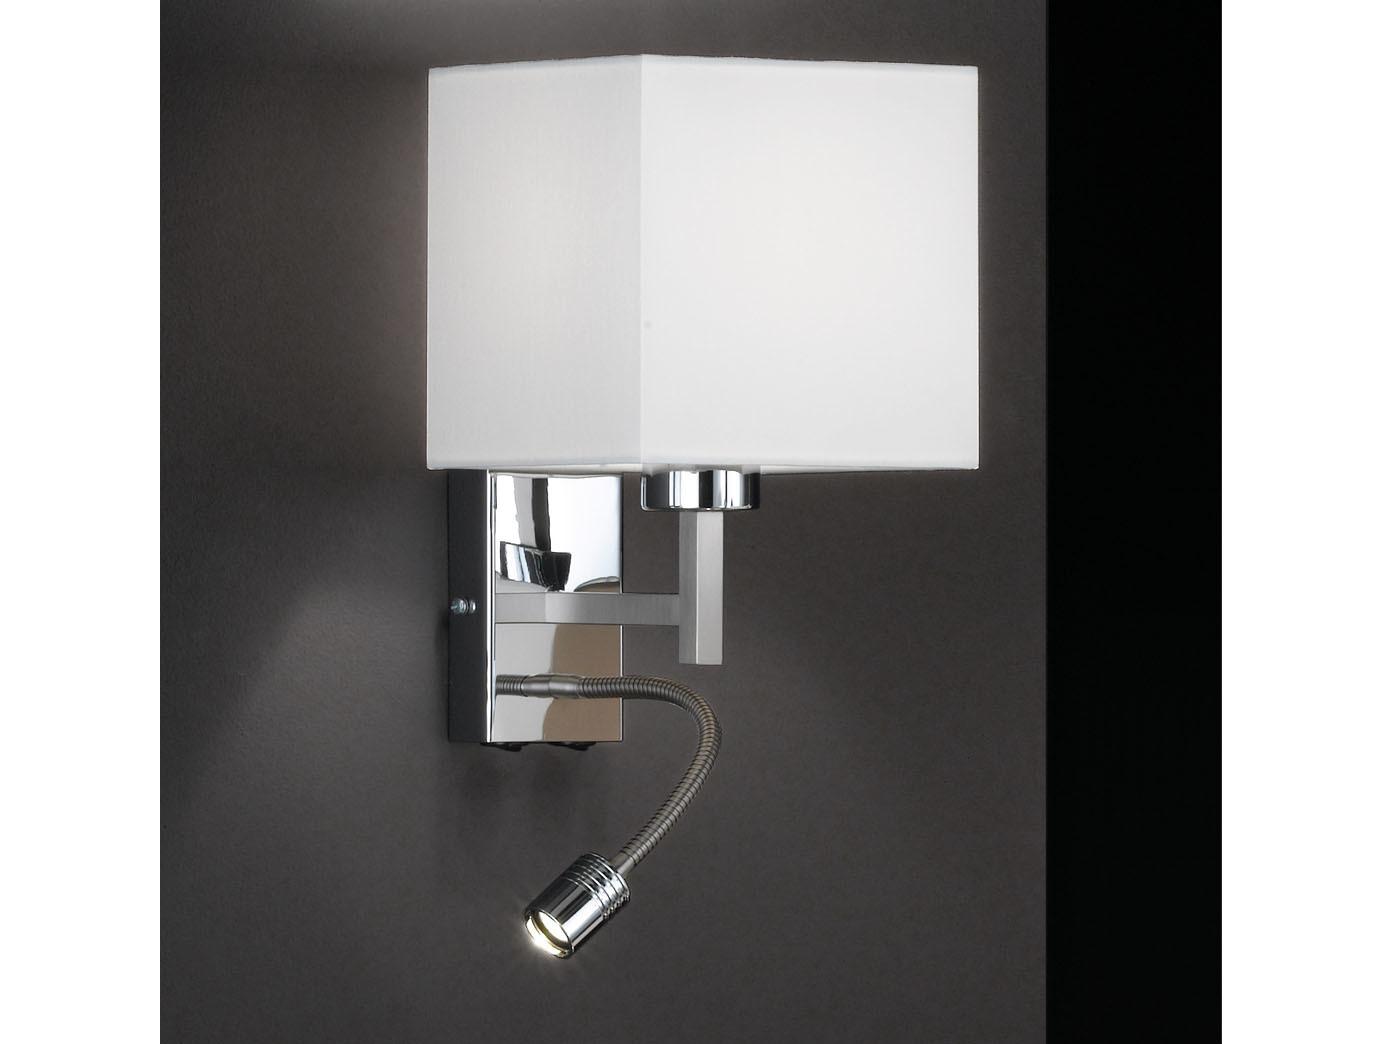 ledleselicht mehr als 20 angebote fotos preise. Black Bedroom Furniture Sets. Home Design Ideas